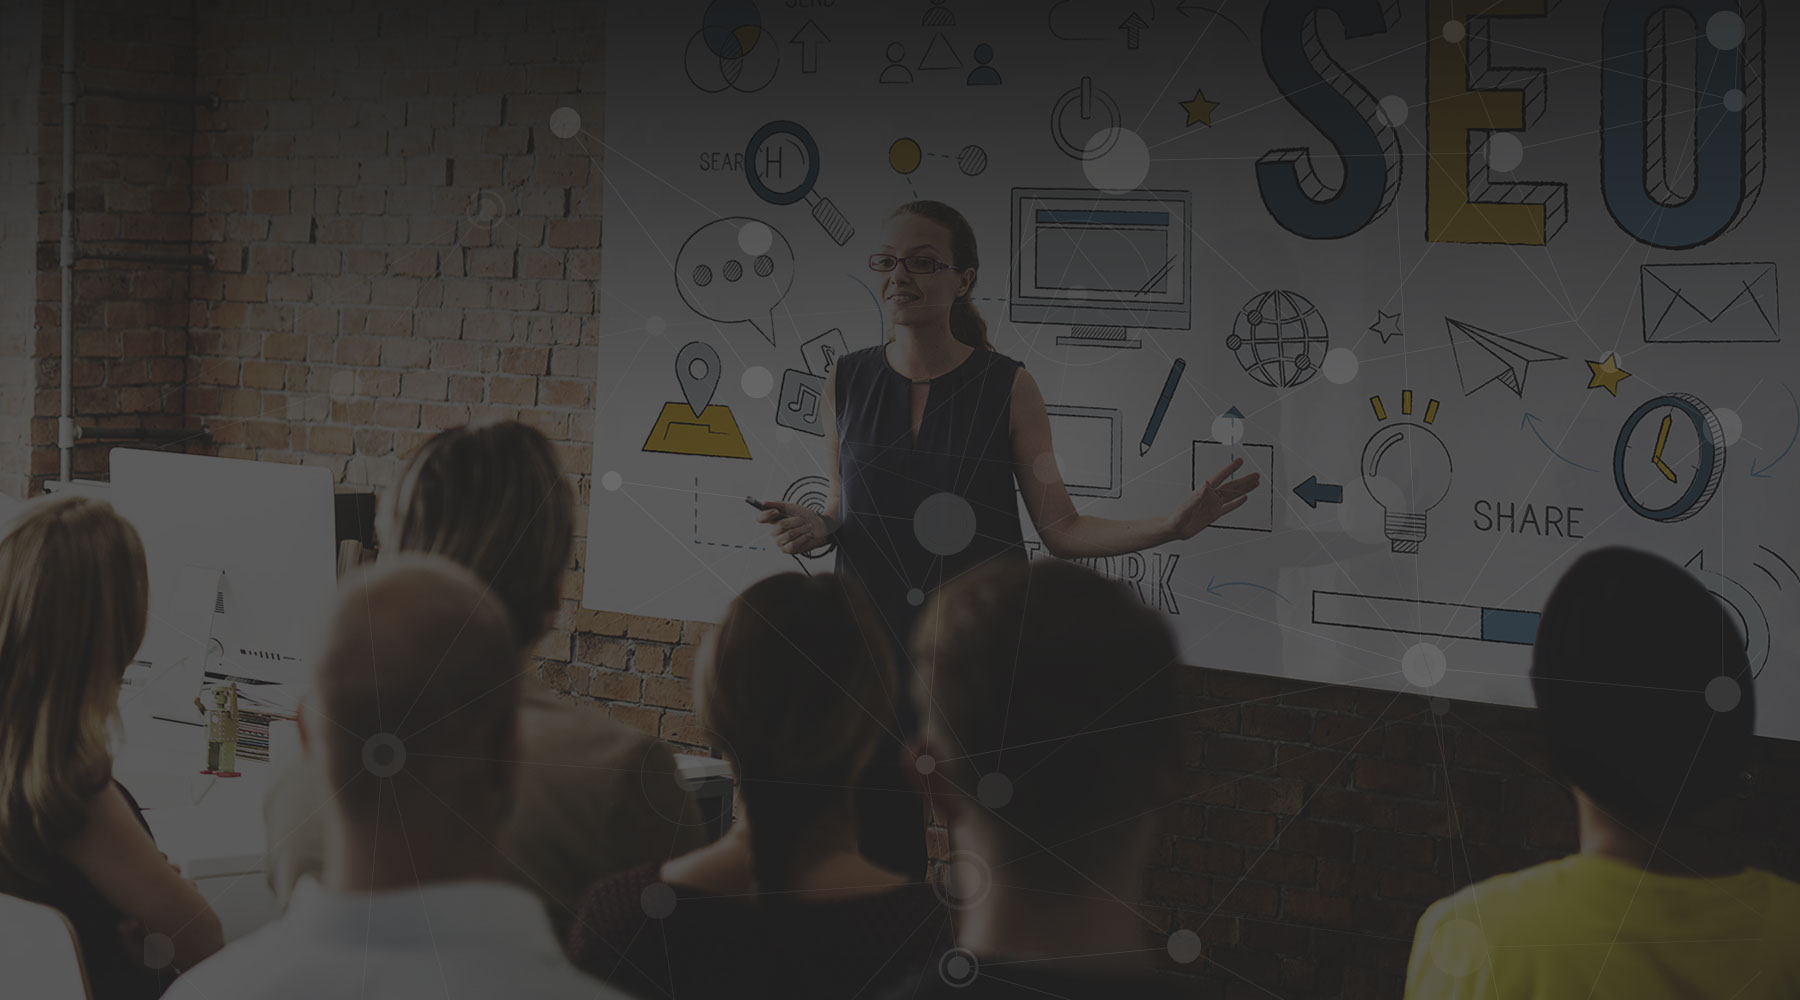 positio marketing online